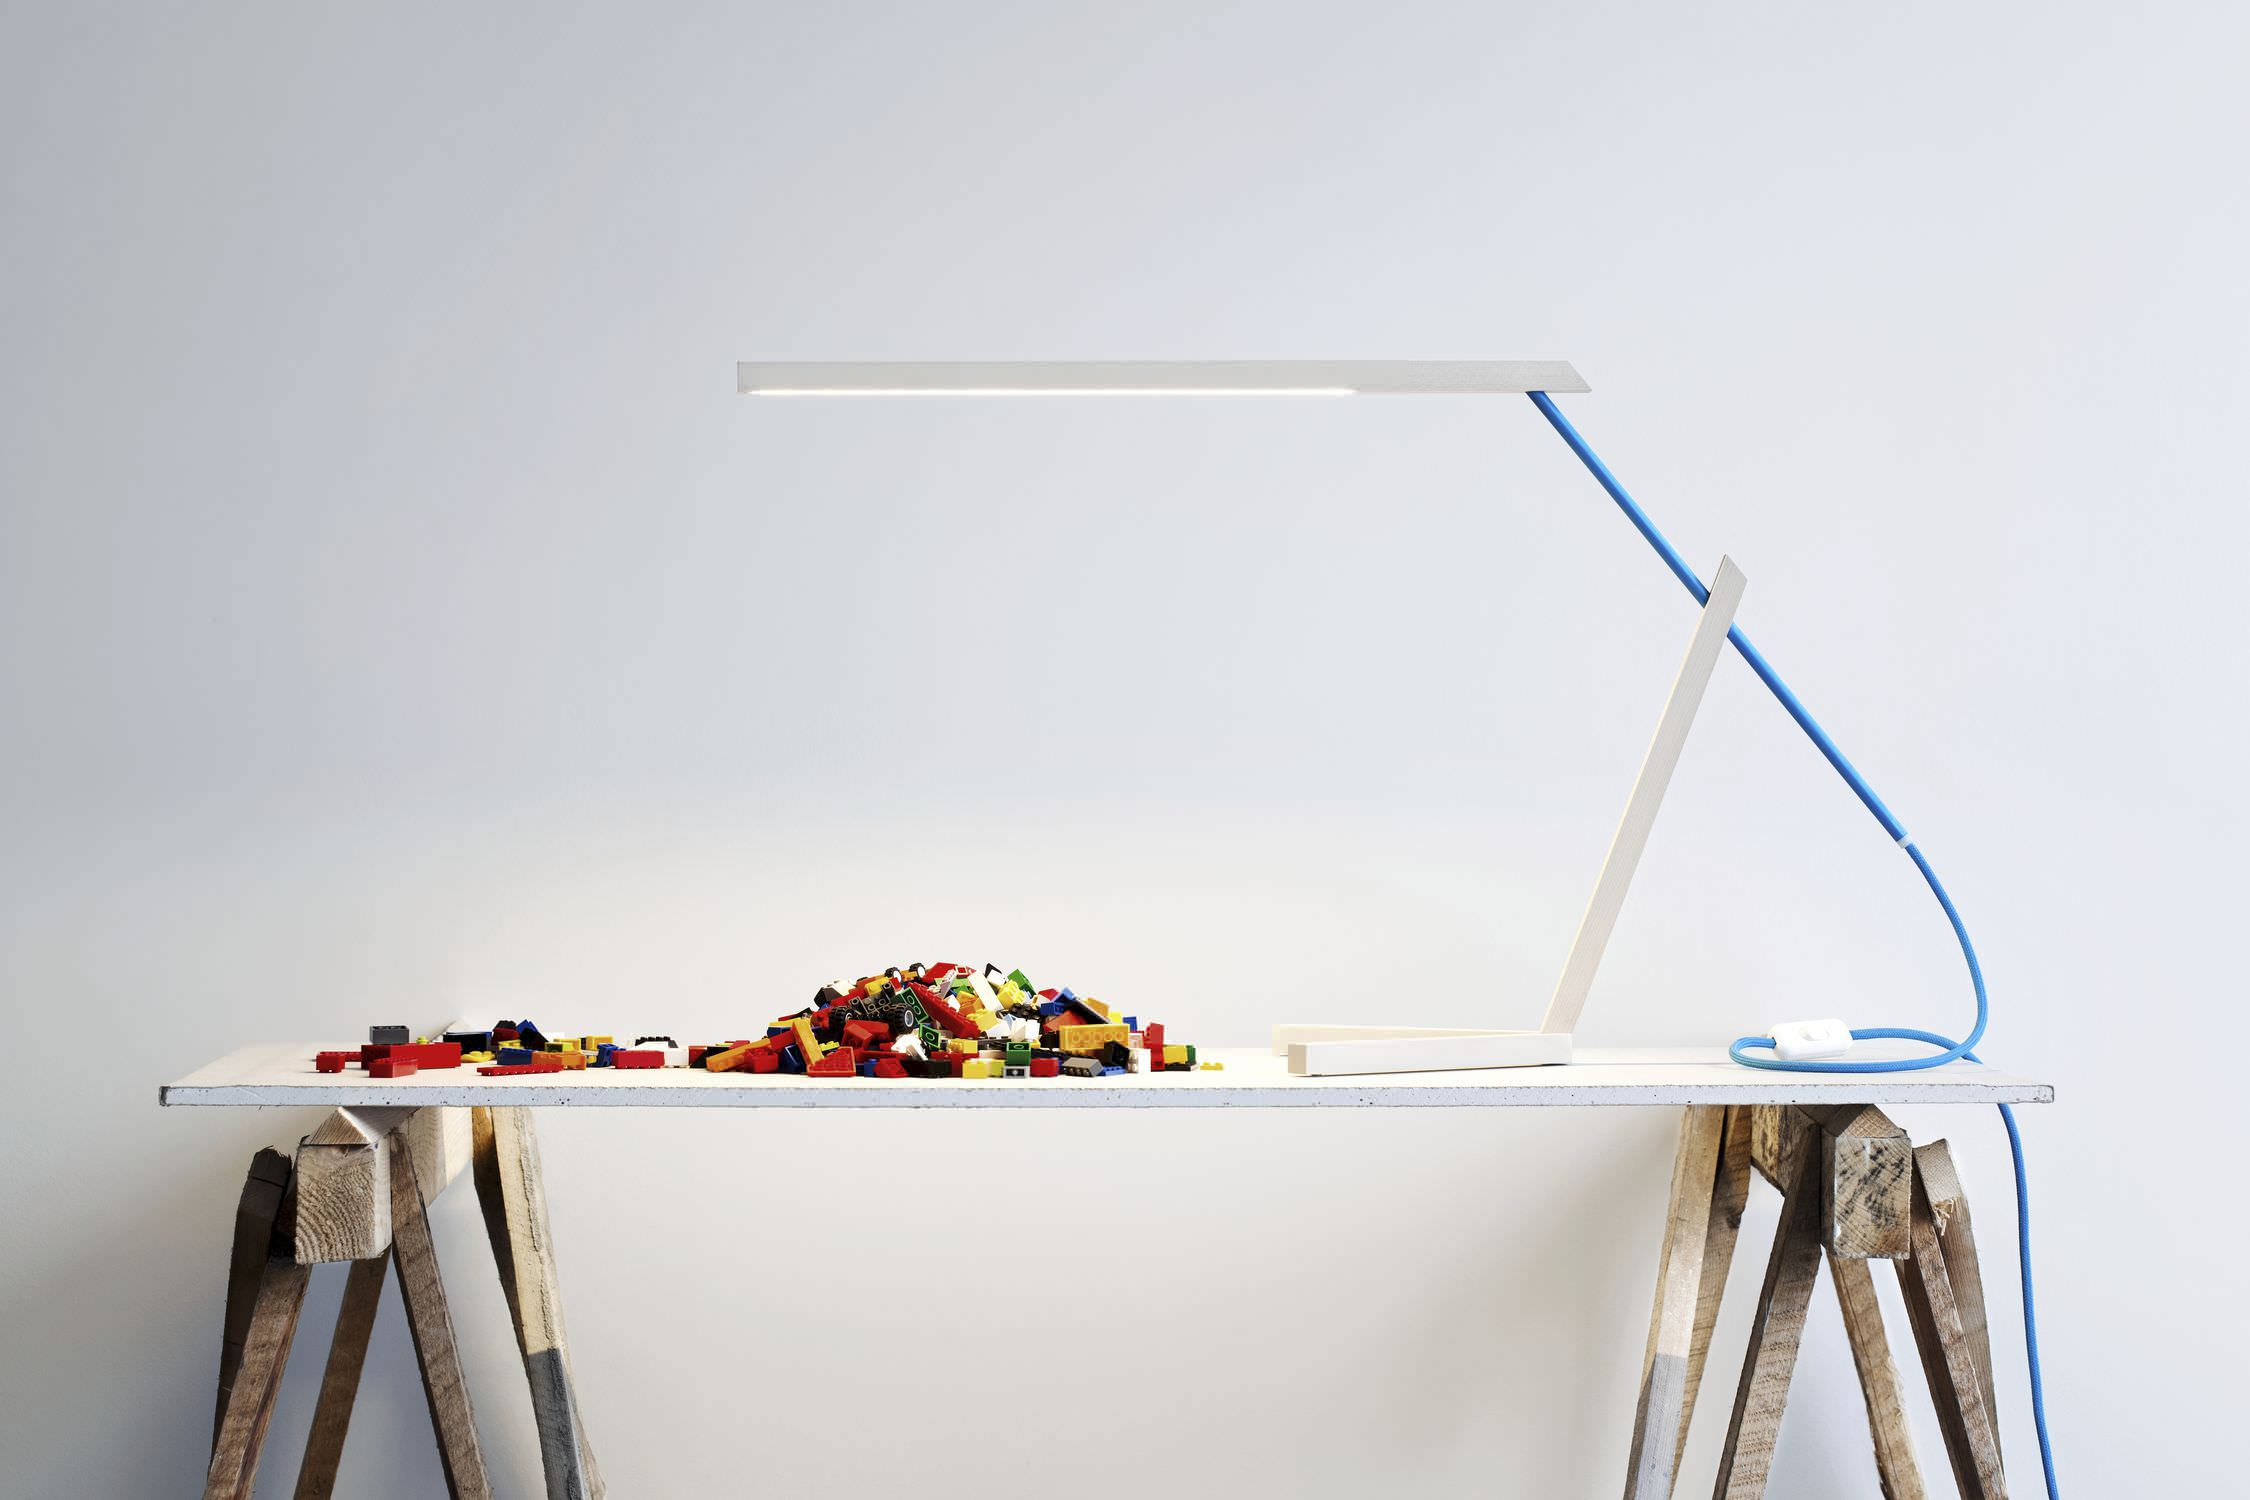 Lampe de bureau design minimaliste en aluminium en érable